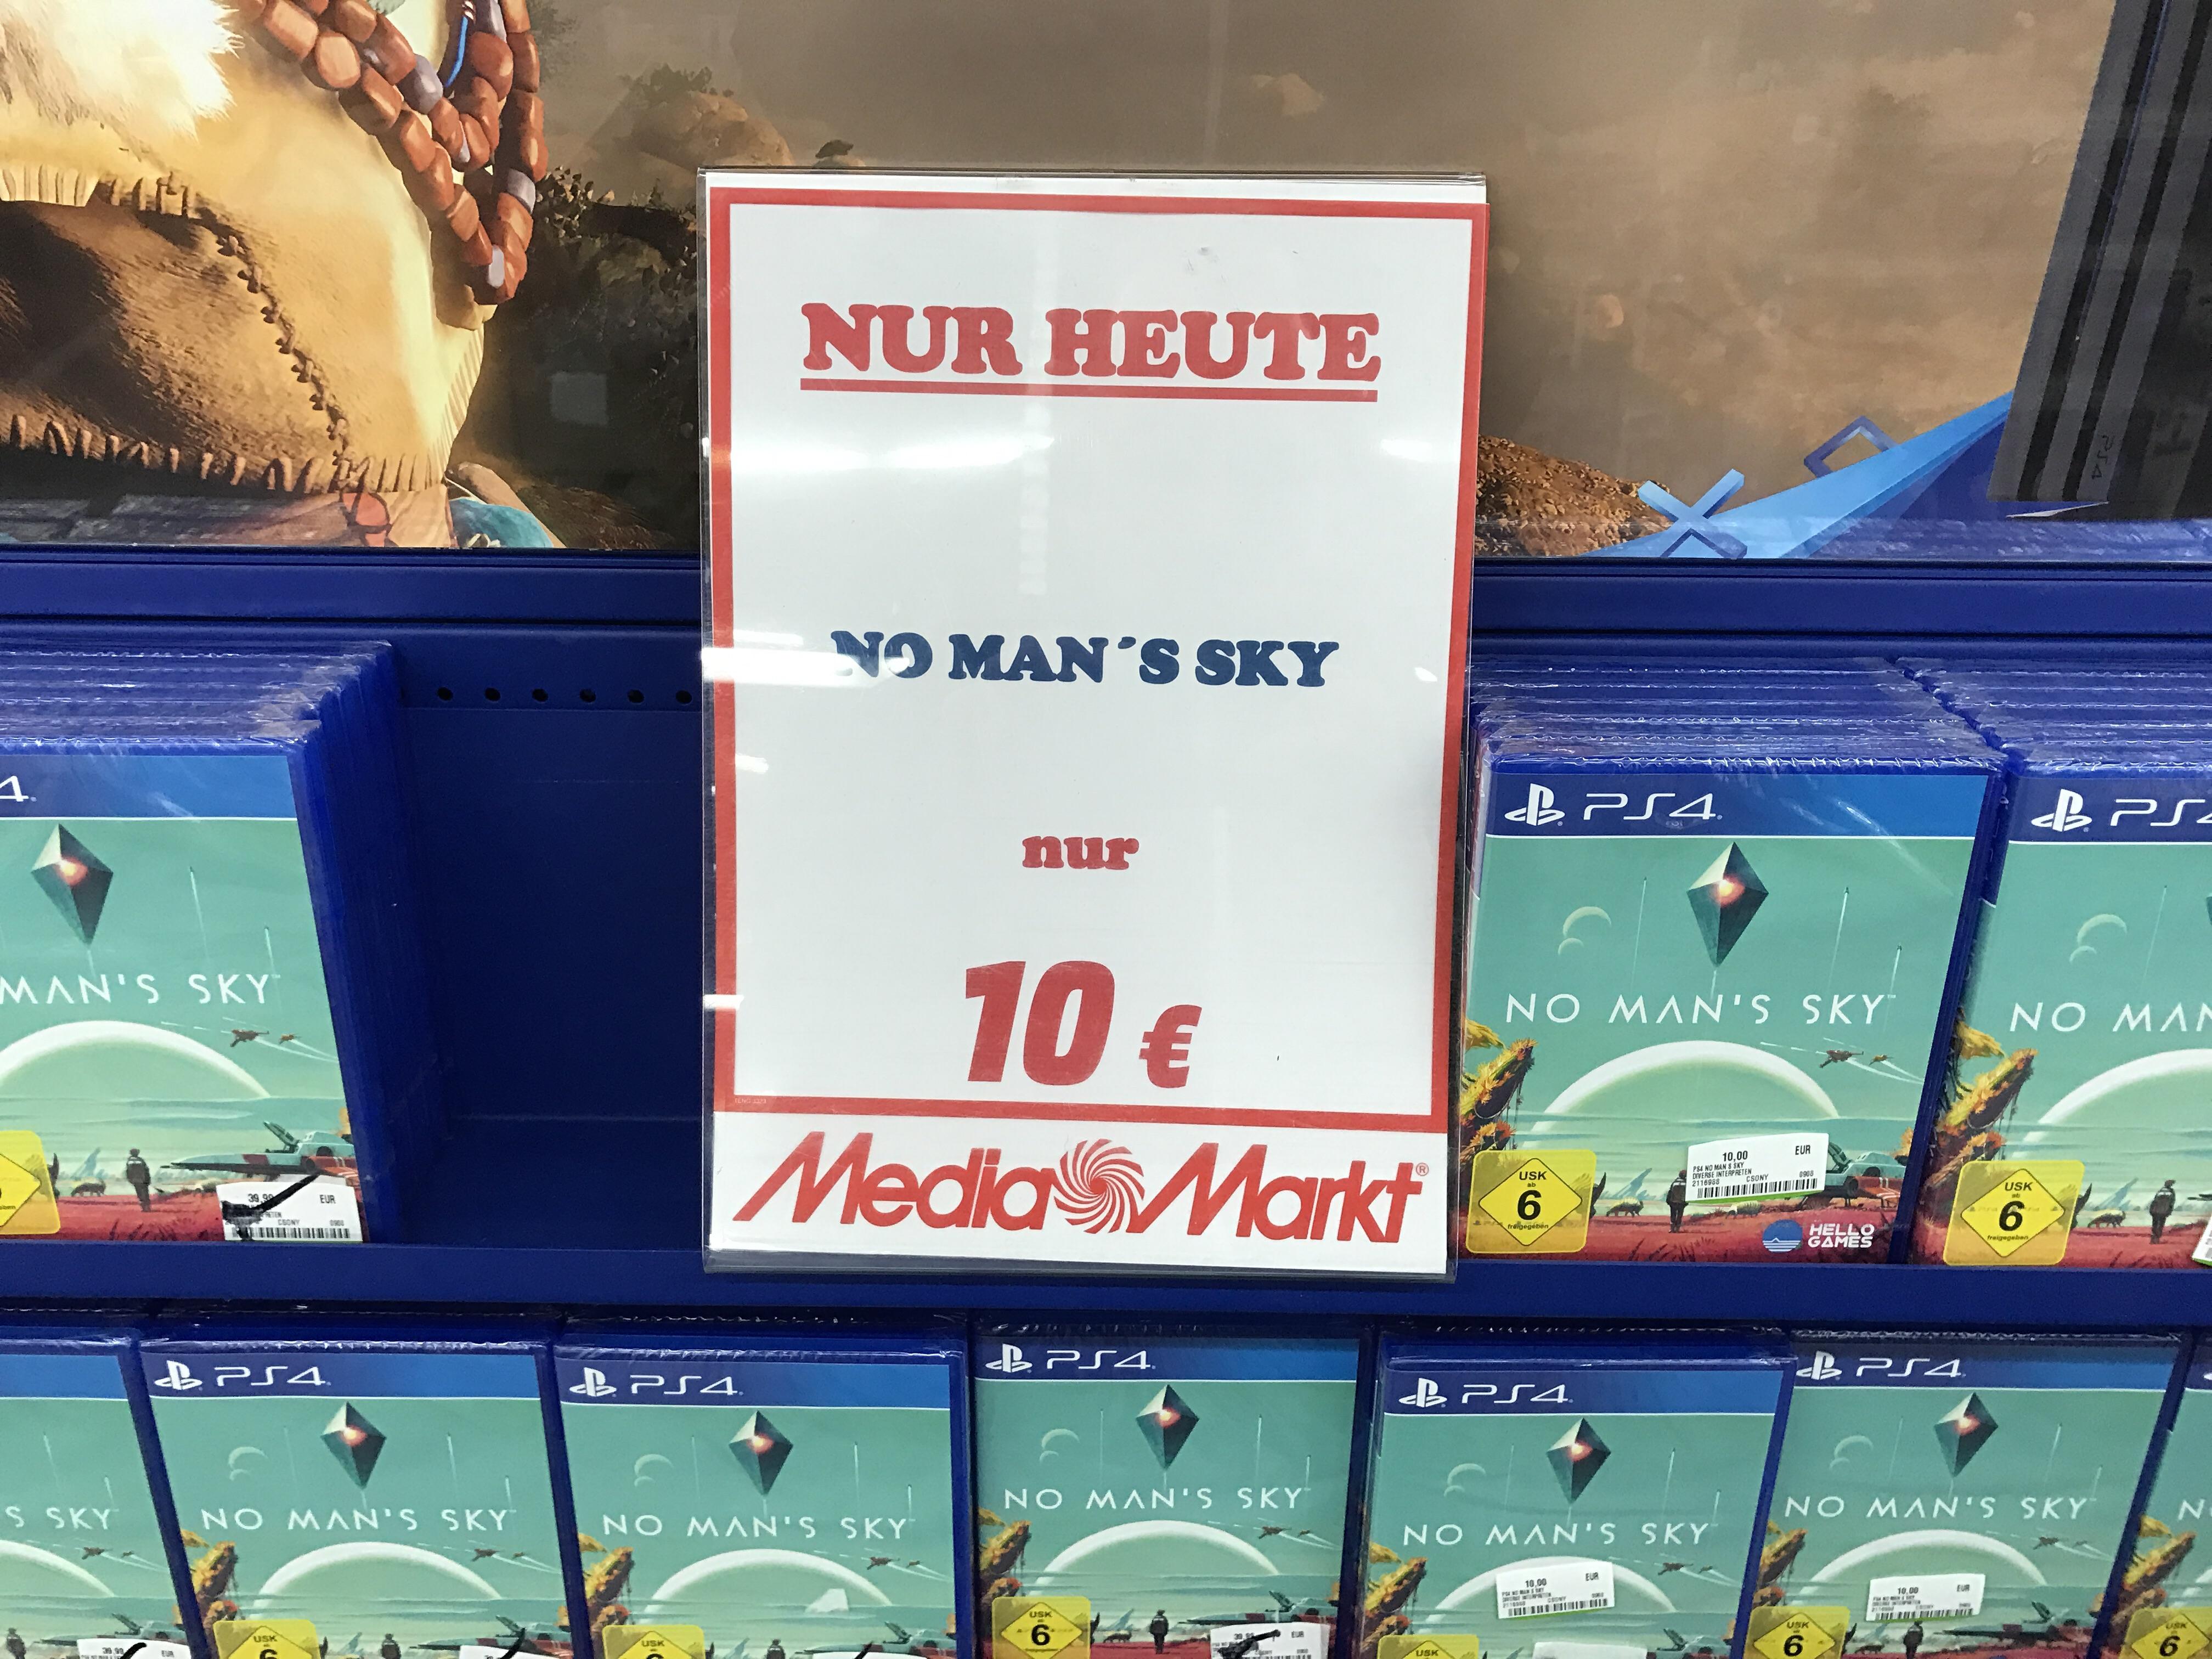 [Lokal] MM Stade - No Man's Sky für nur 10€